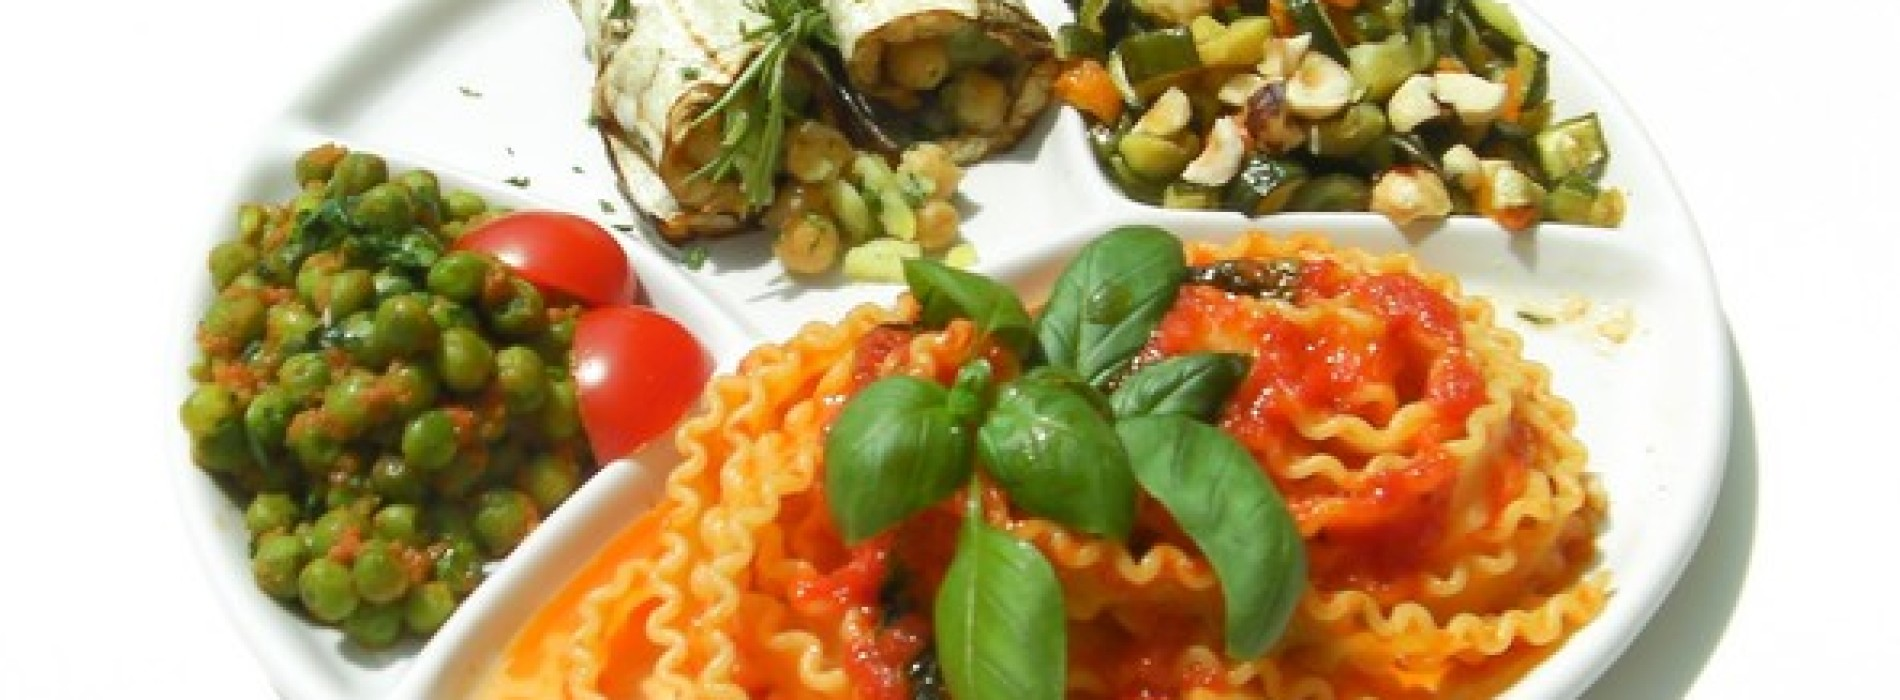 Ristoranti Vegani a Napoli